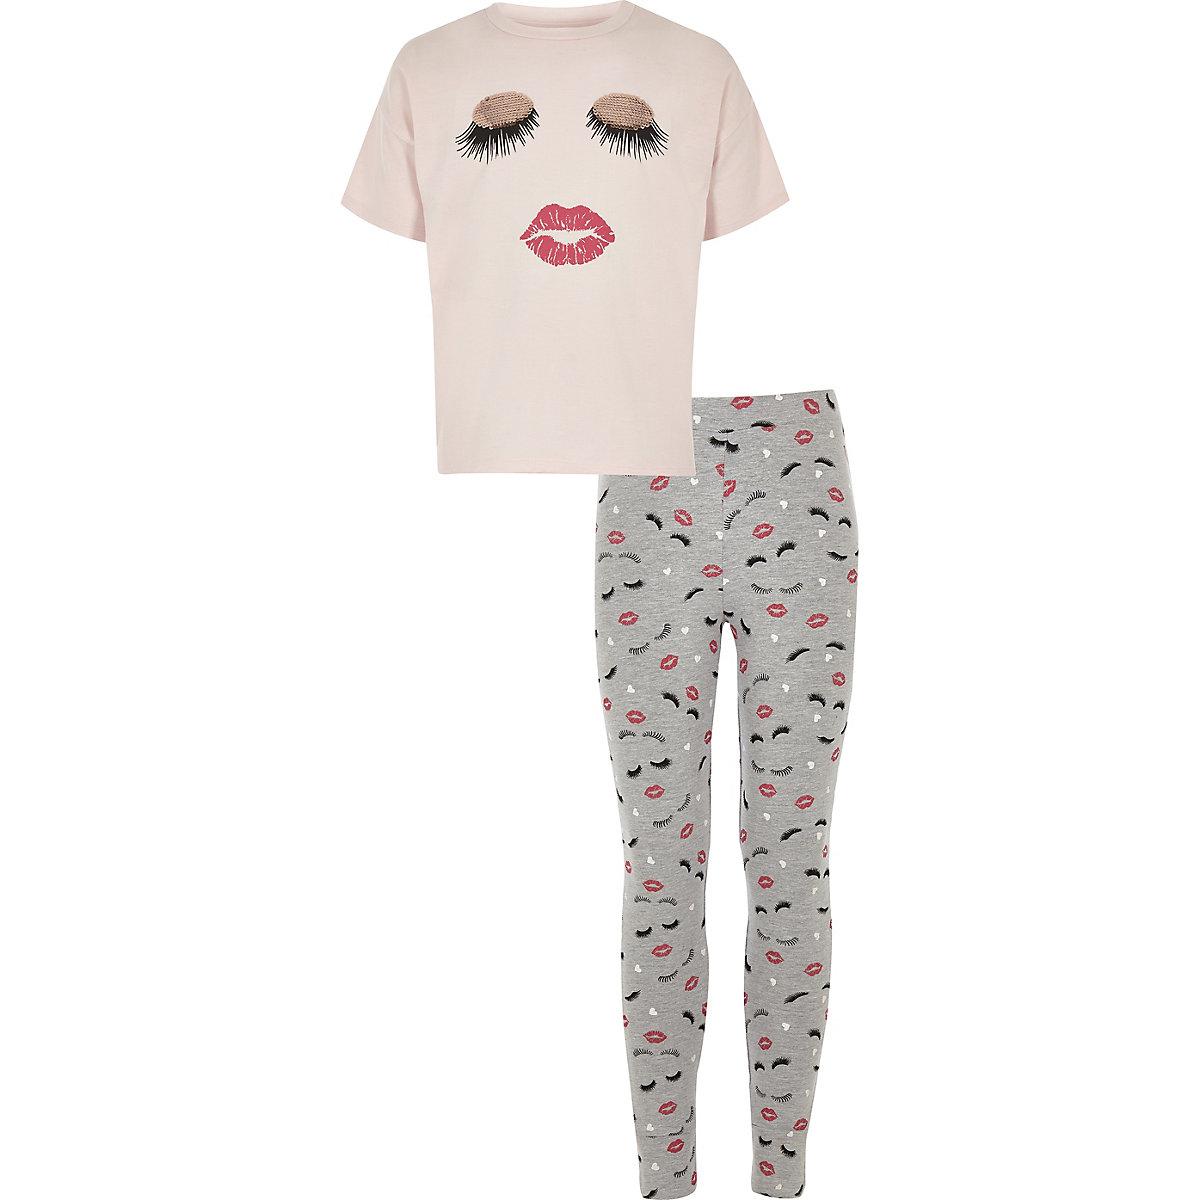 Girls pink eyelash and lips pyjama set